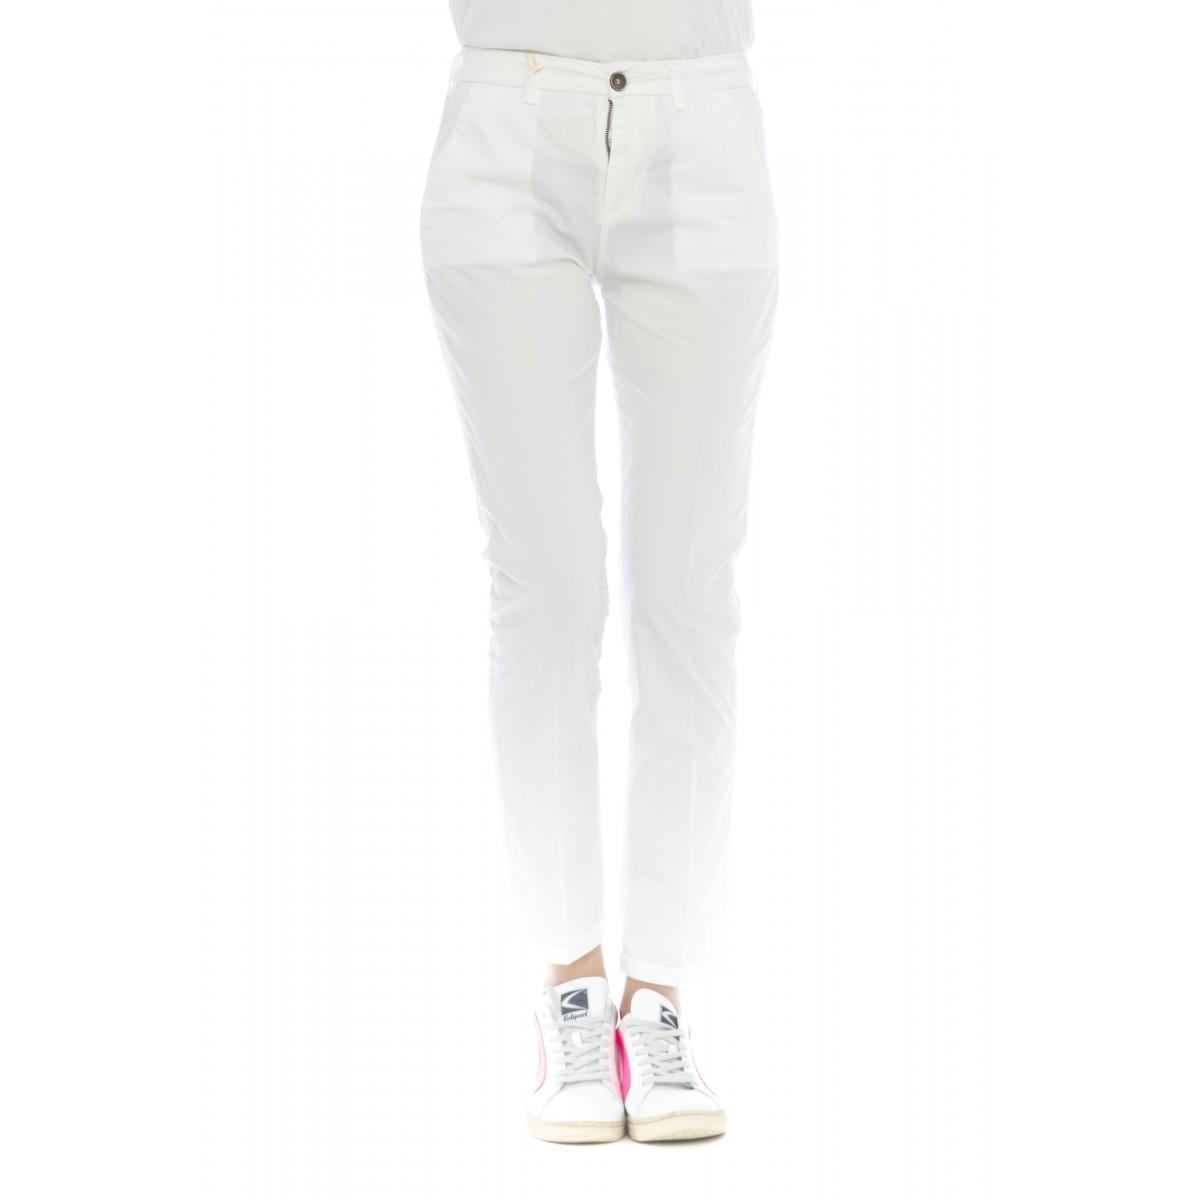 Pantalone donna - Briana 4272 skinny vita alta microperato